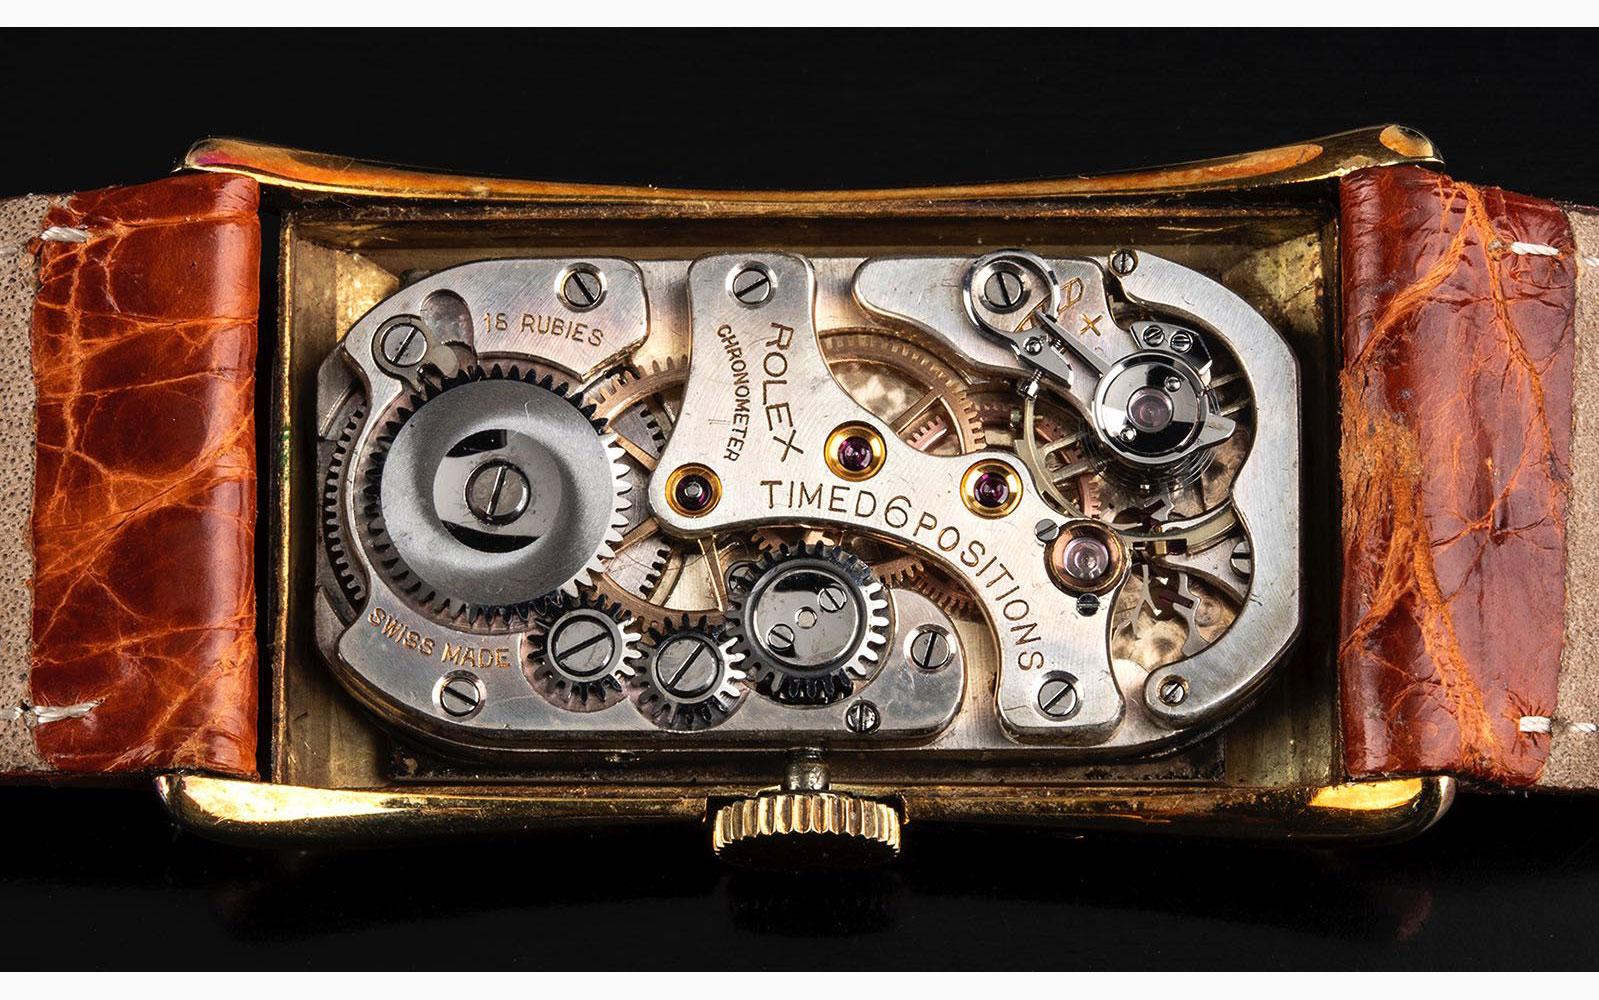 Rolex Prince ¼ Century club gold, 1947 - Image 2 of 4